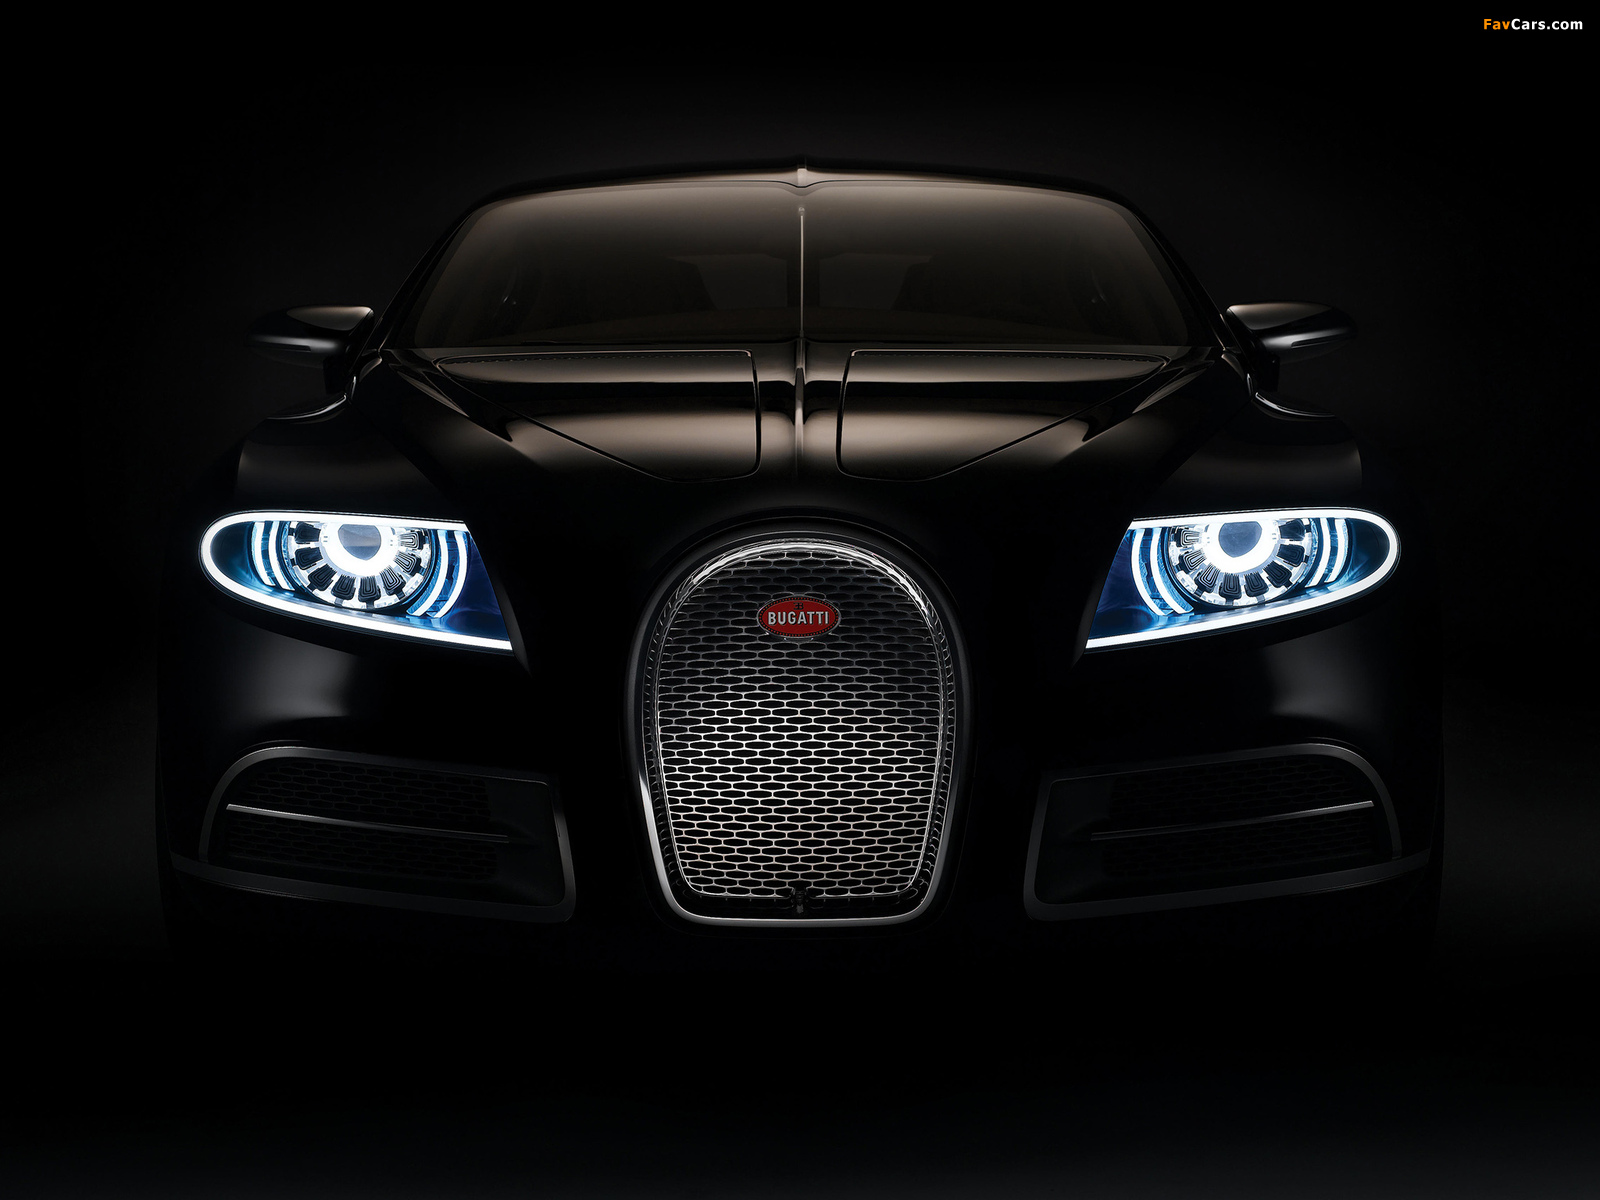 Bugatti 16C Galibier Concept 2009 images (1600 x 1200)